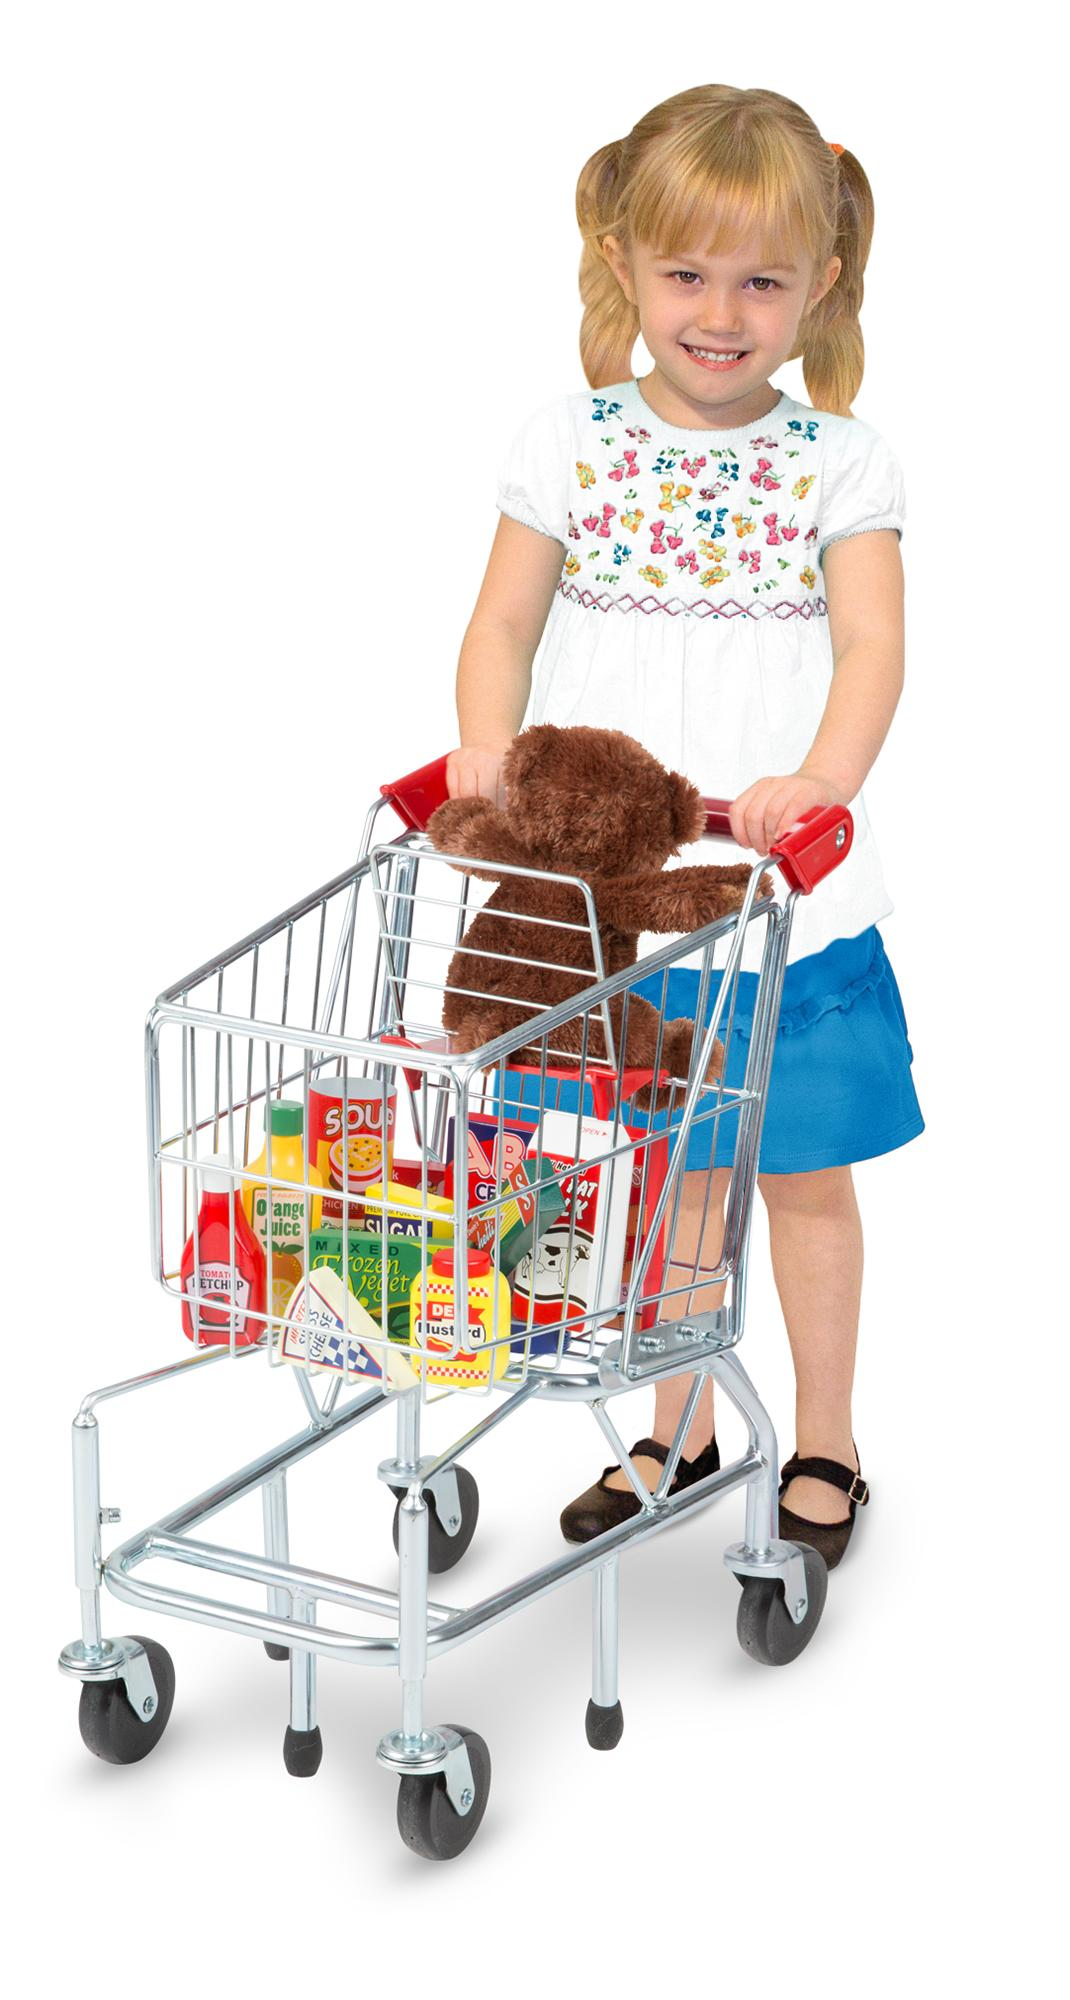 Melissa Doug Toys : Melissa doug shopping trolley with sturdy metal frame